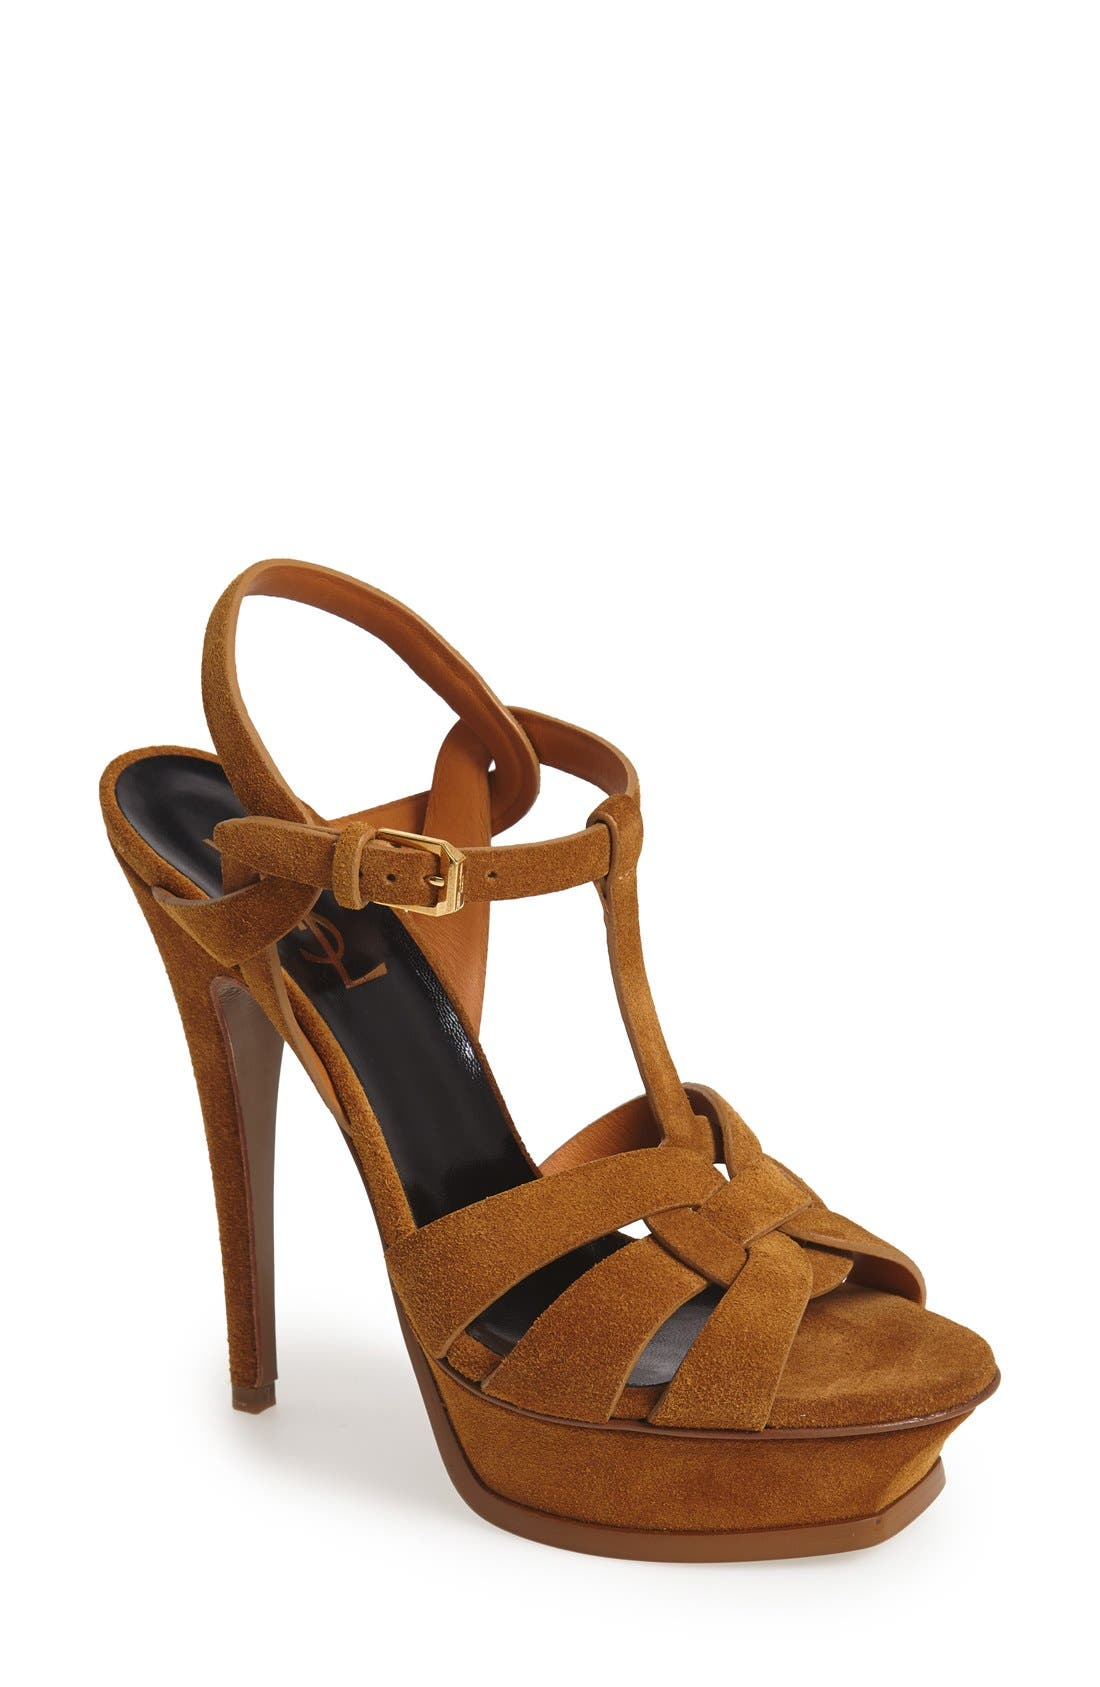 Alternate Image 1 Selected - Saint Laurent 'Tribute' Suede T-Strap Sandal (Women)